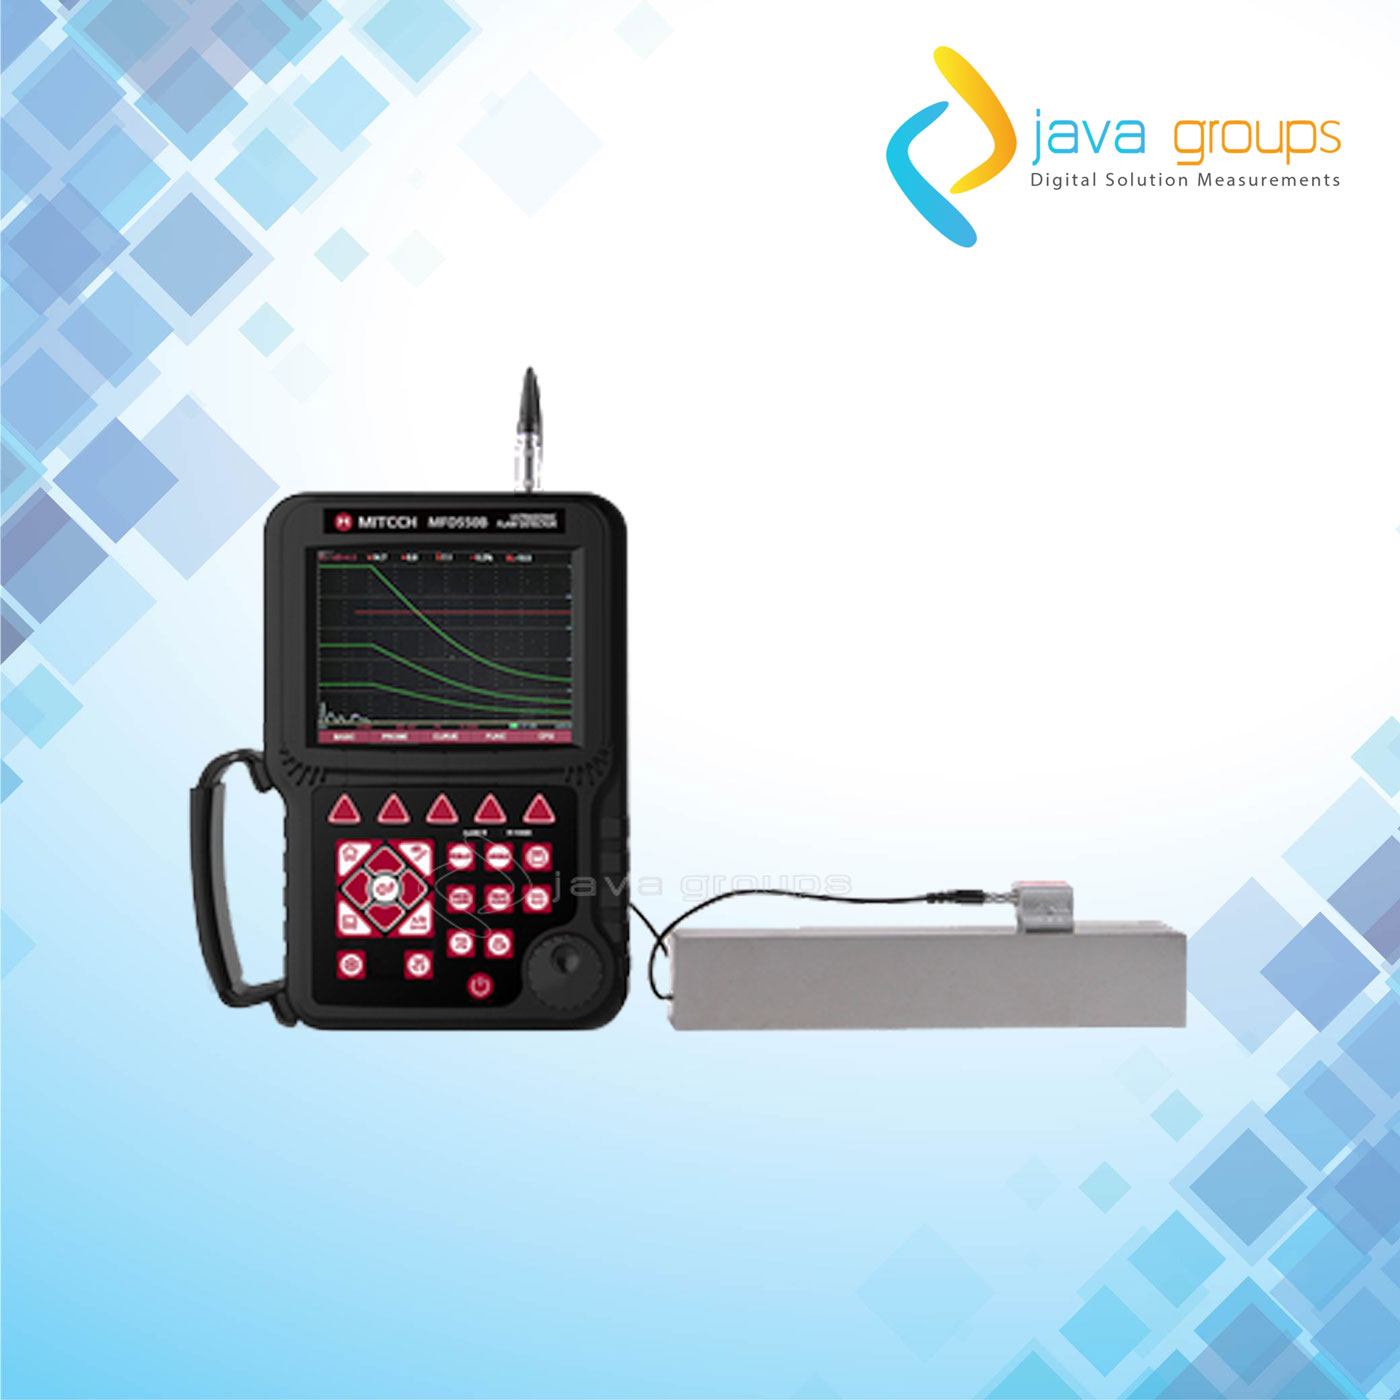 Alat Pendeteksi Kecacatan Ultrasonic Mitech MFD550B